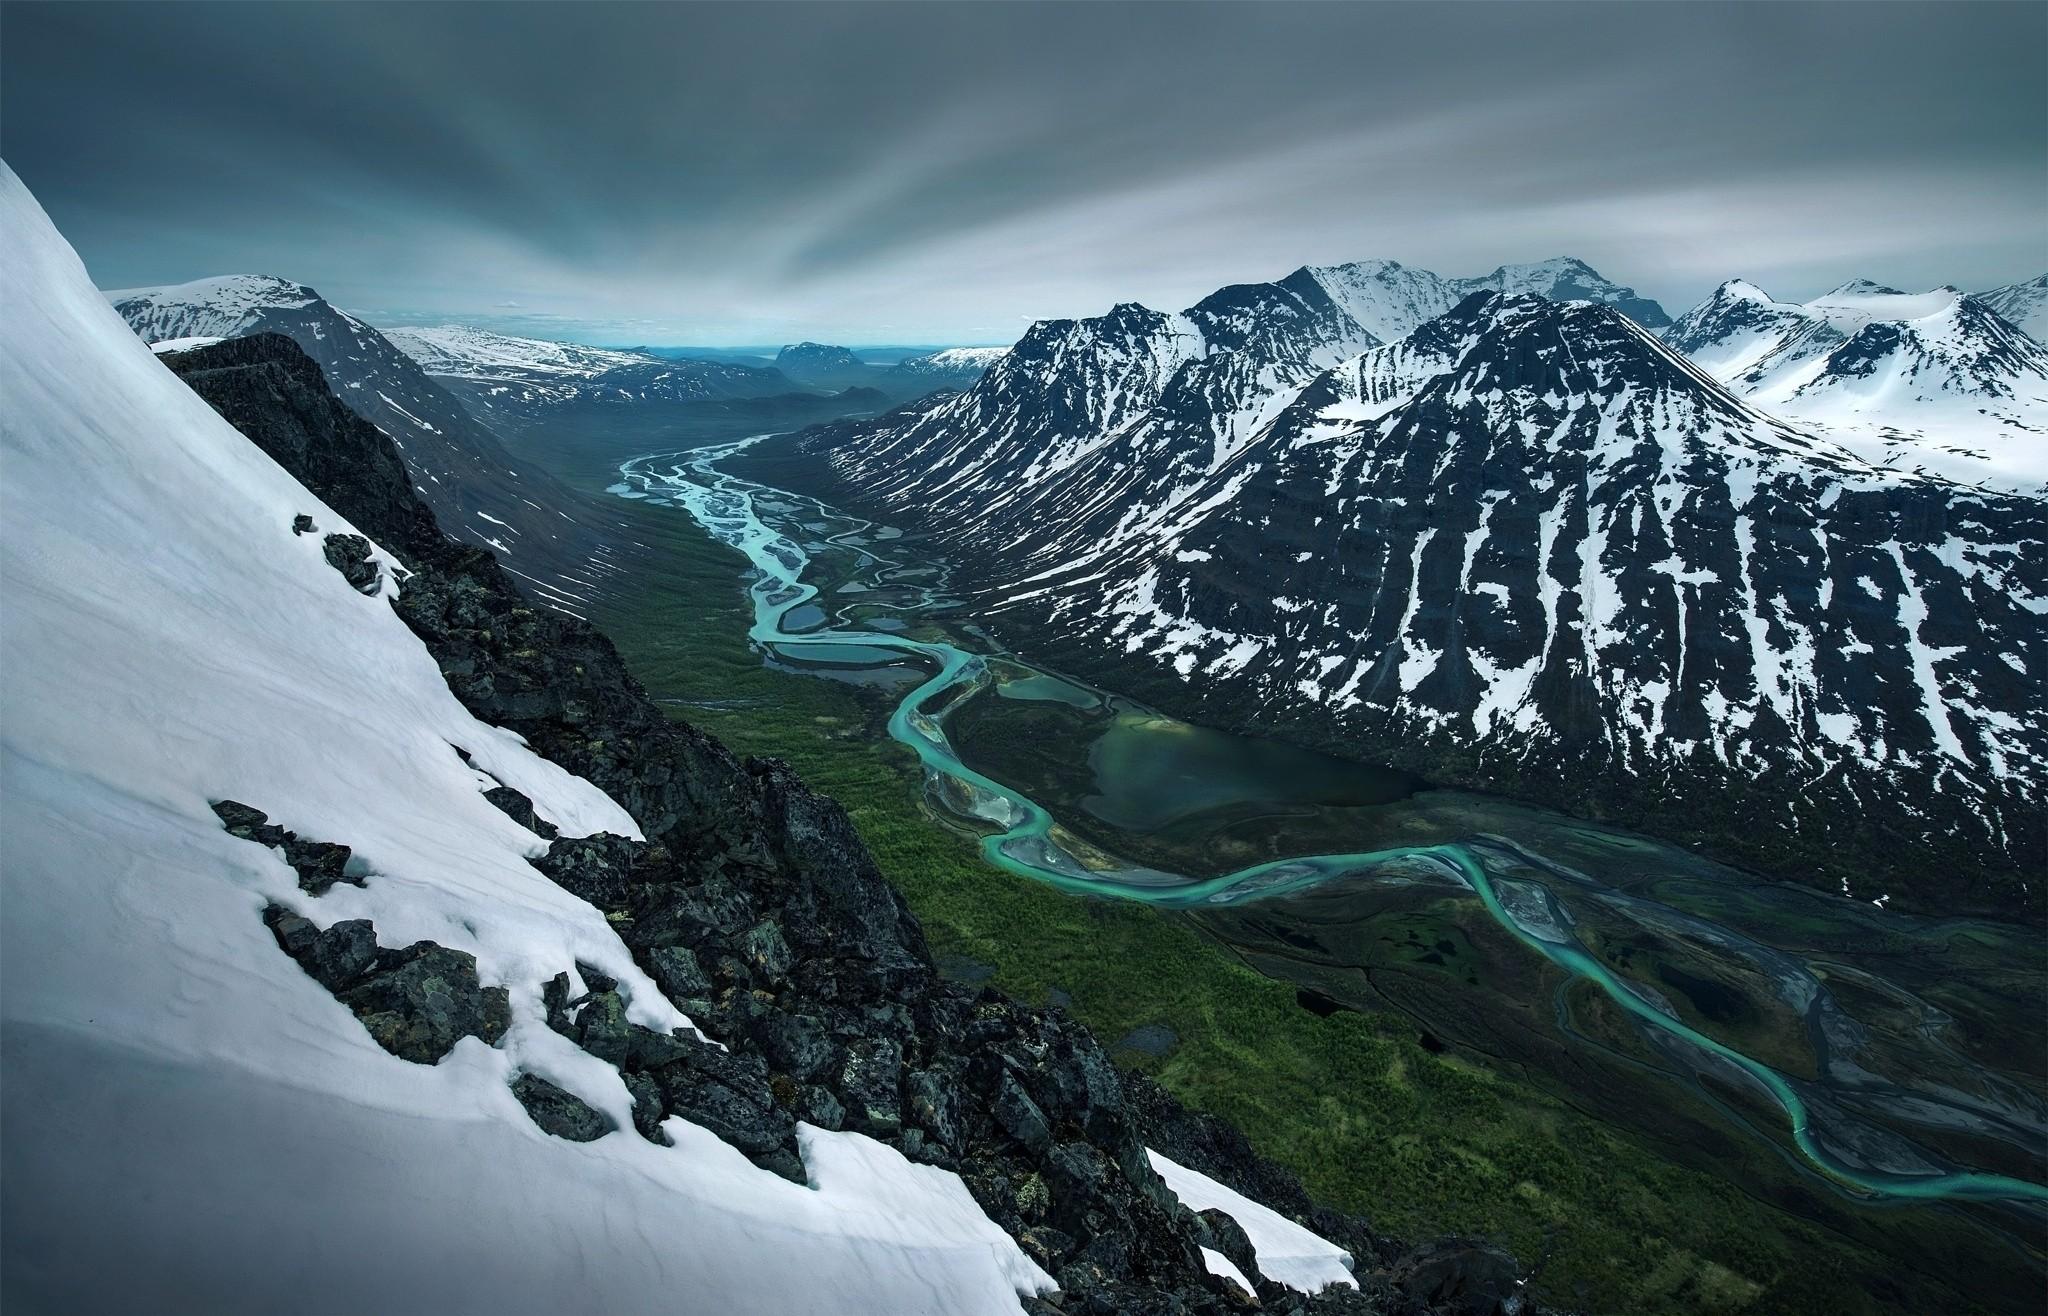 General 2048x1316 nature landscape mountains snow river valley snowy peak spring Sweden